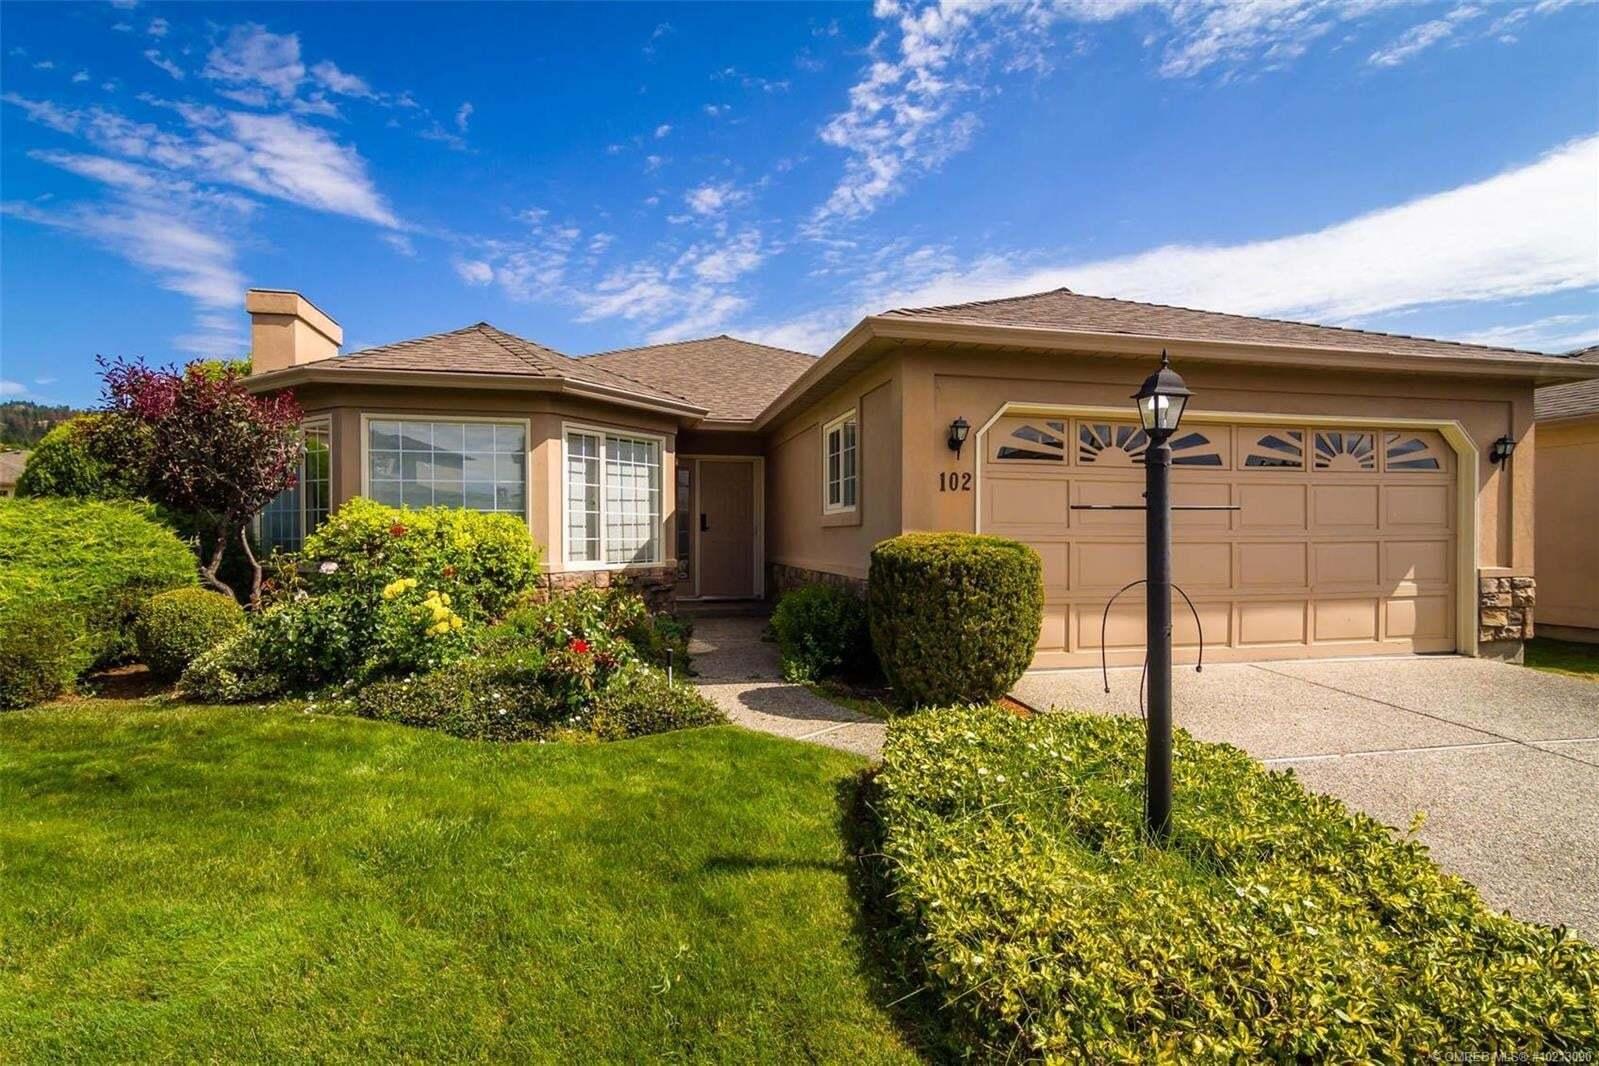 Townhouse for sale at 595 Yates Rd Unit 102 Kelowna British Columbia - MLS: 10213090